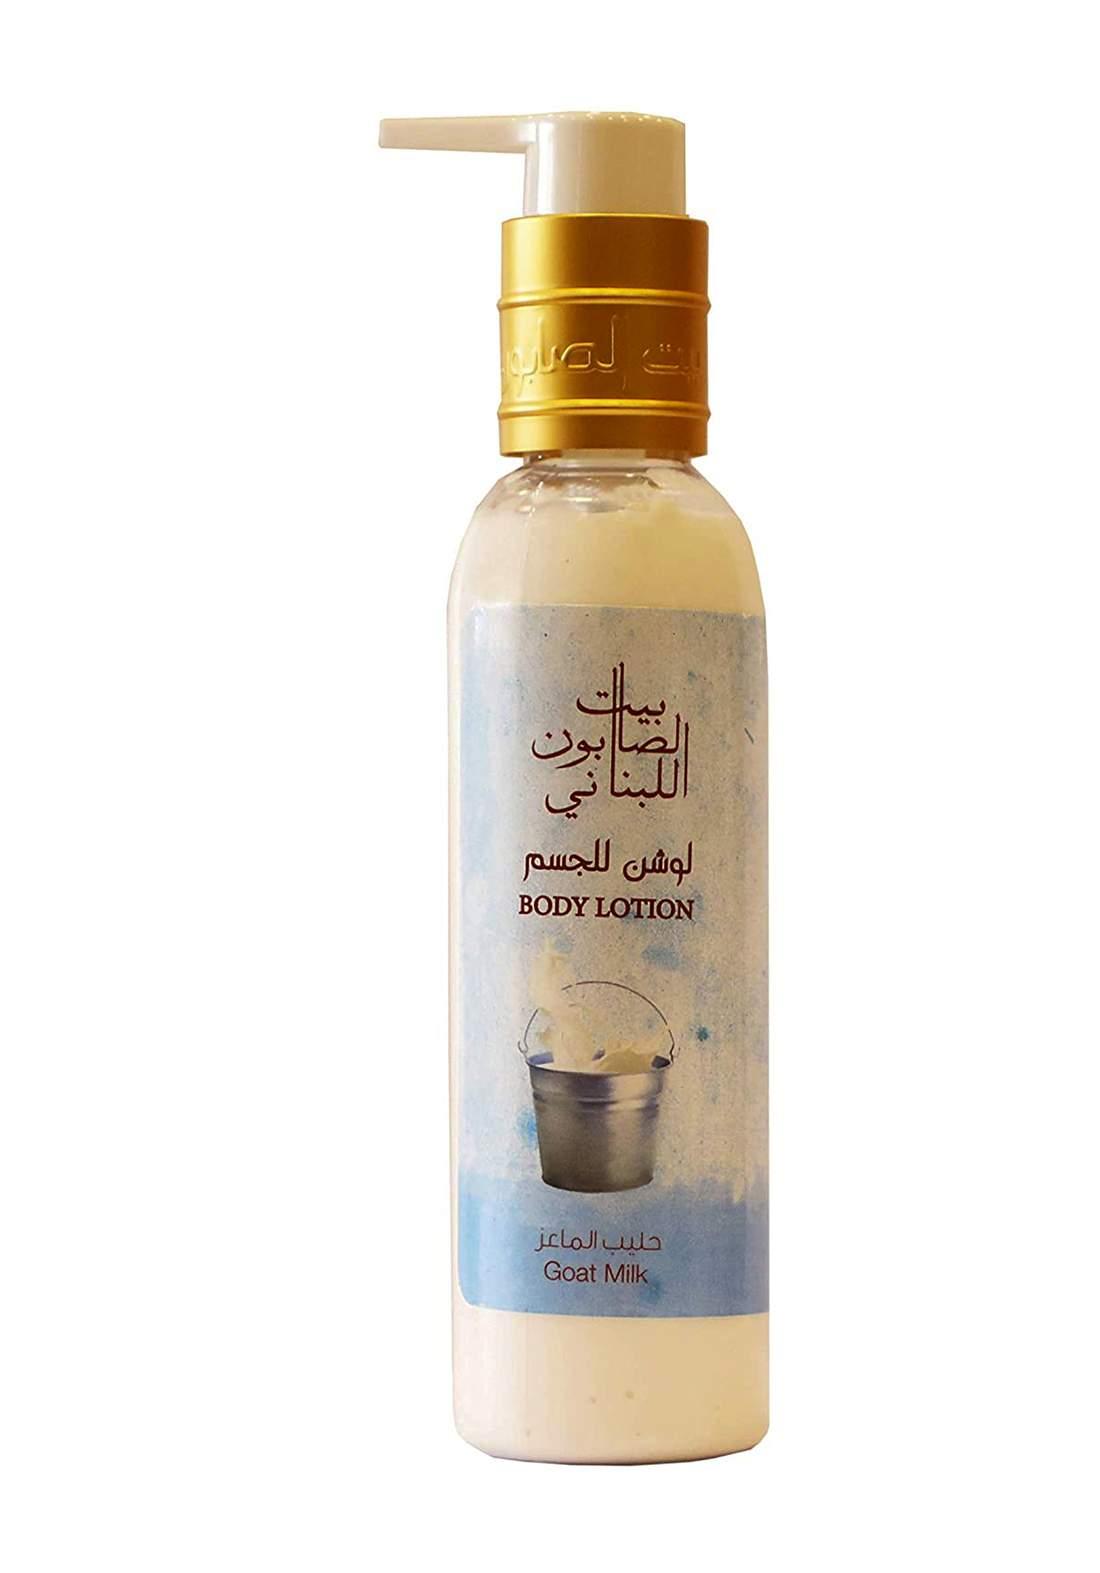 Bayt Alsaboun Alloubnani-317487 Body Lotion Goat Milk 150 Ml لوشن للجسم